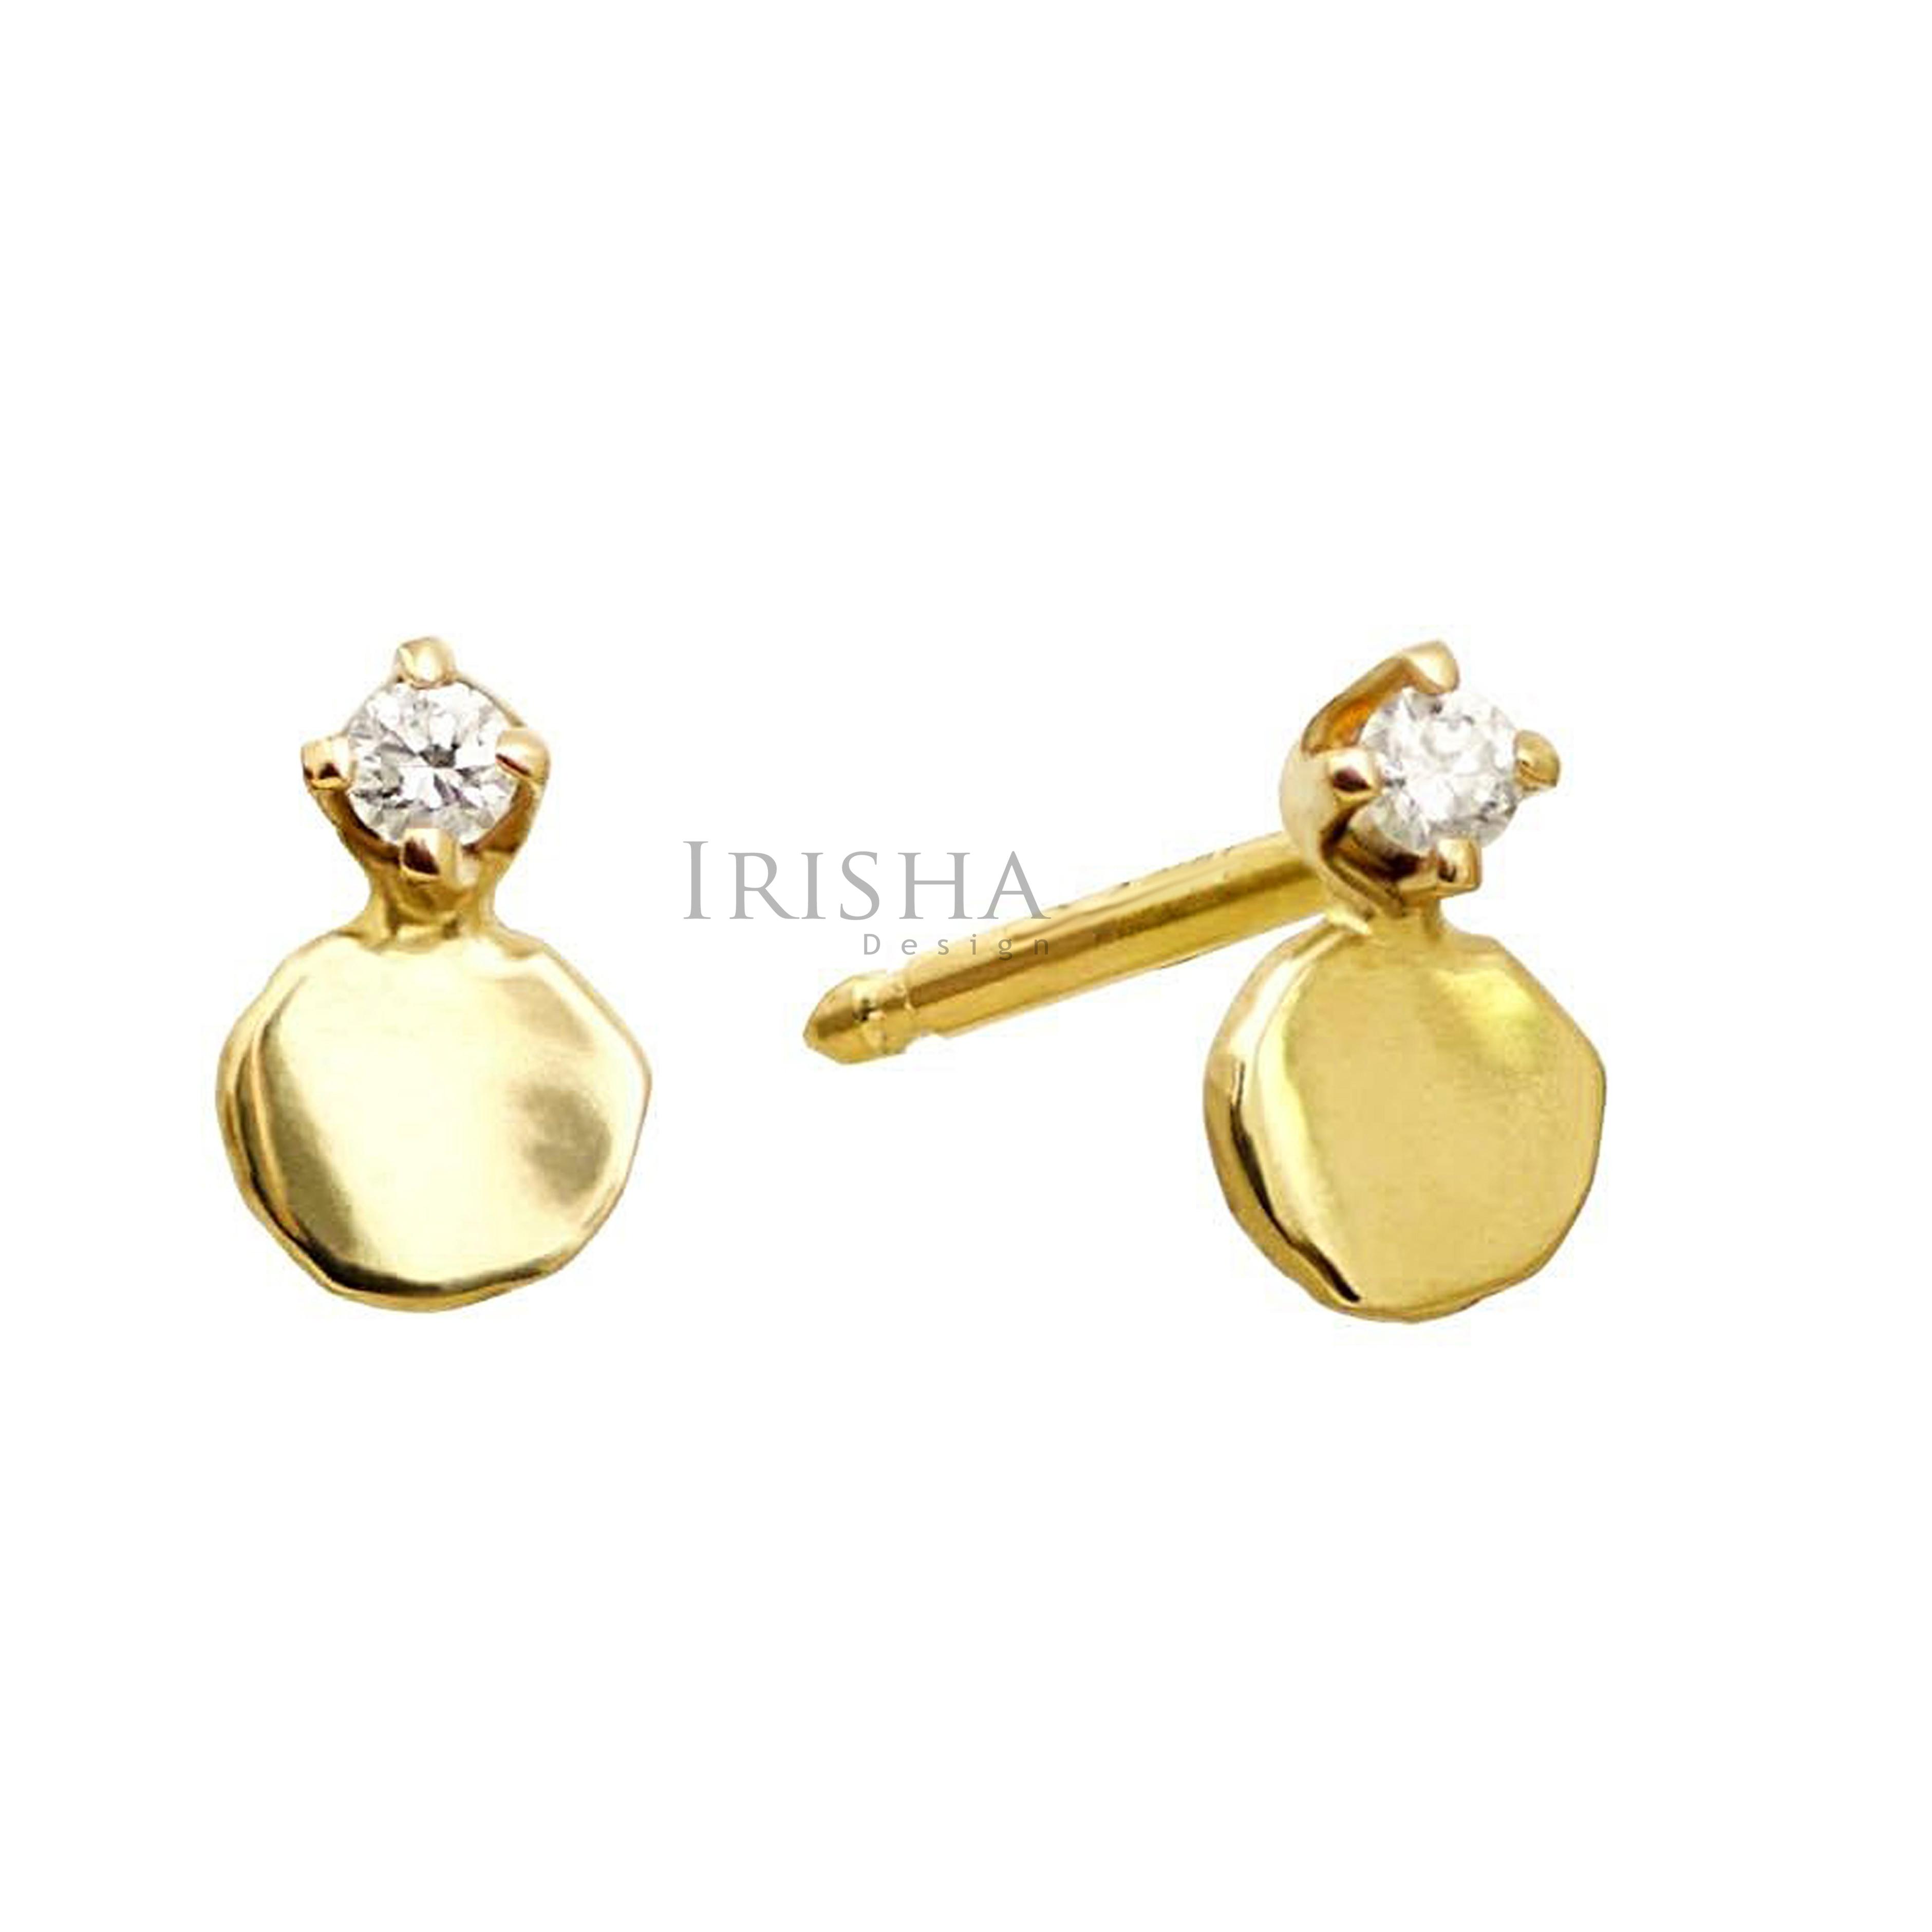 14K Gold 0.06 Ct. Genuine Diamond Small Disc Studs Earring Handmade Fine Jewelry